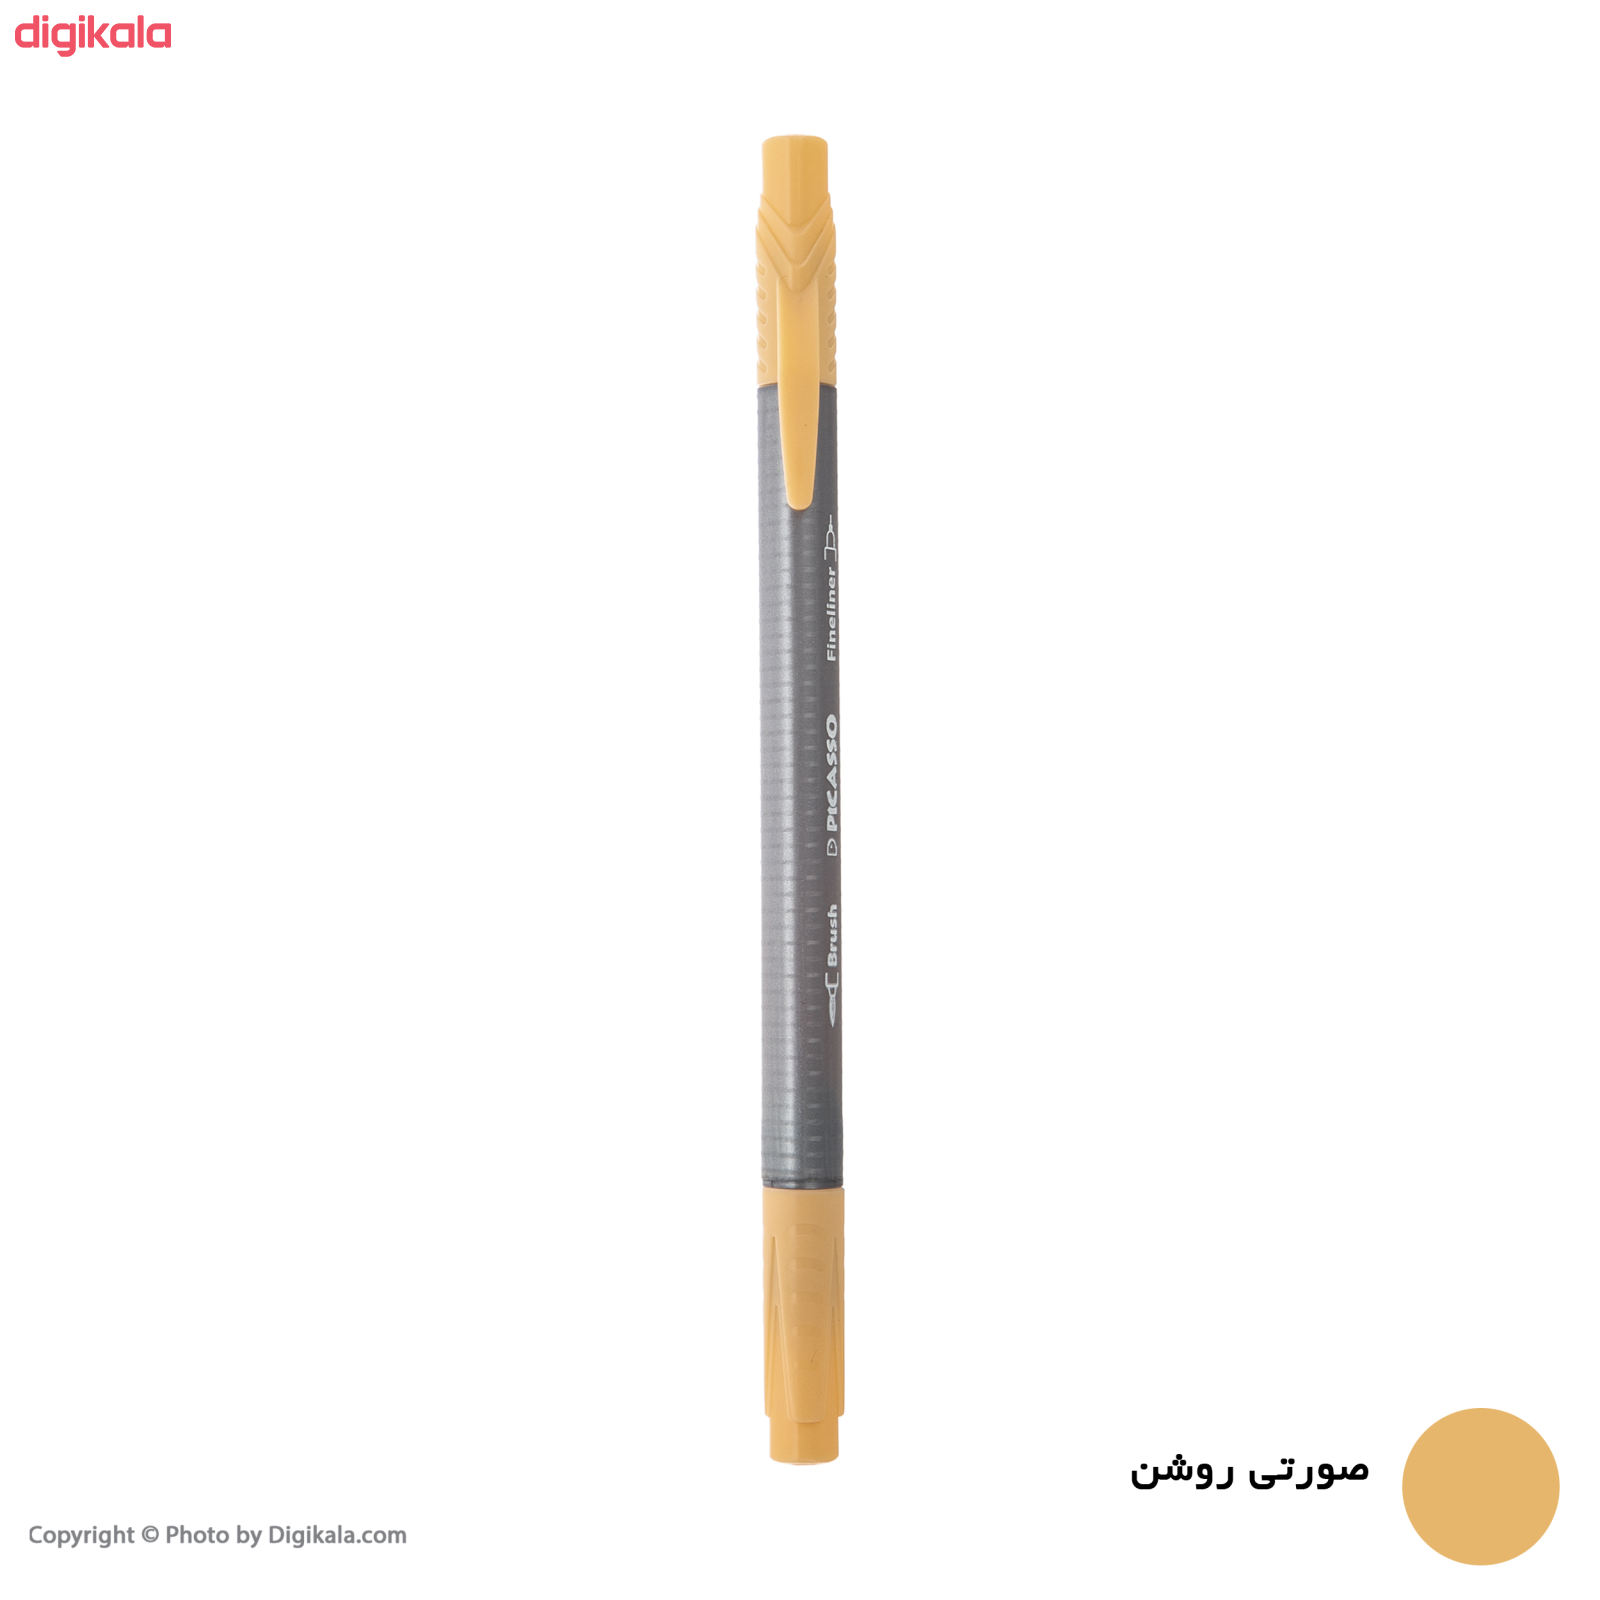 روان نویس پیکاسو مدل Brush Marker Fine Liner main 1 8